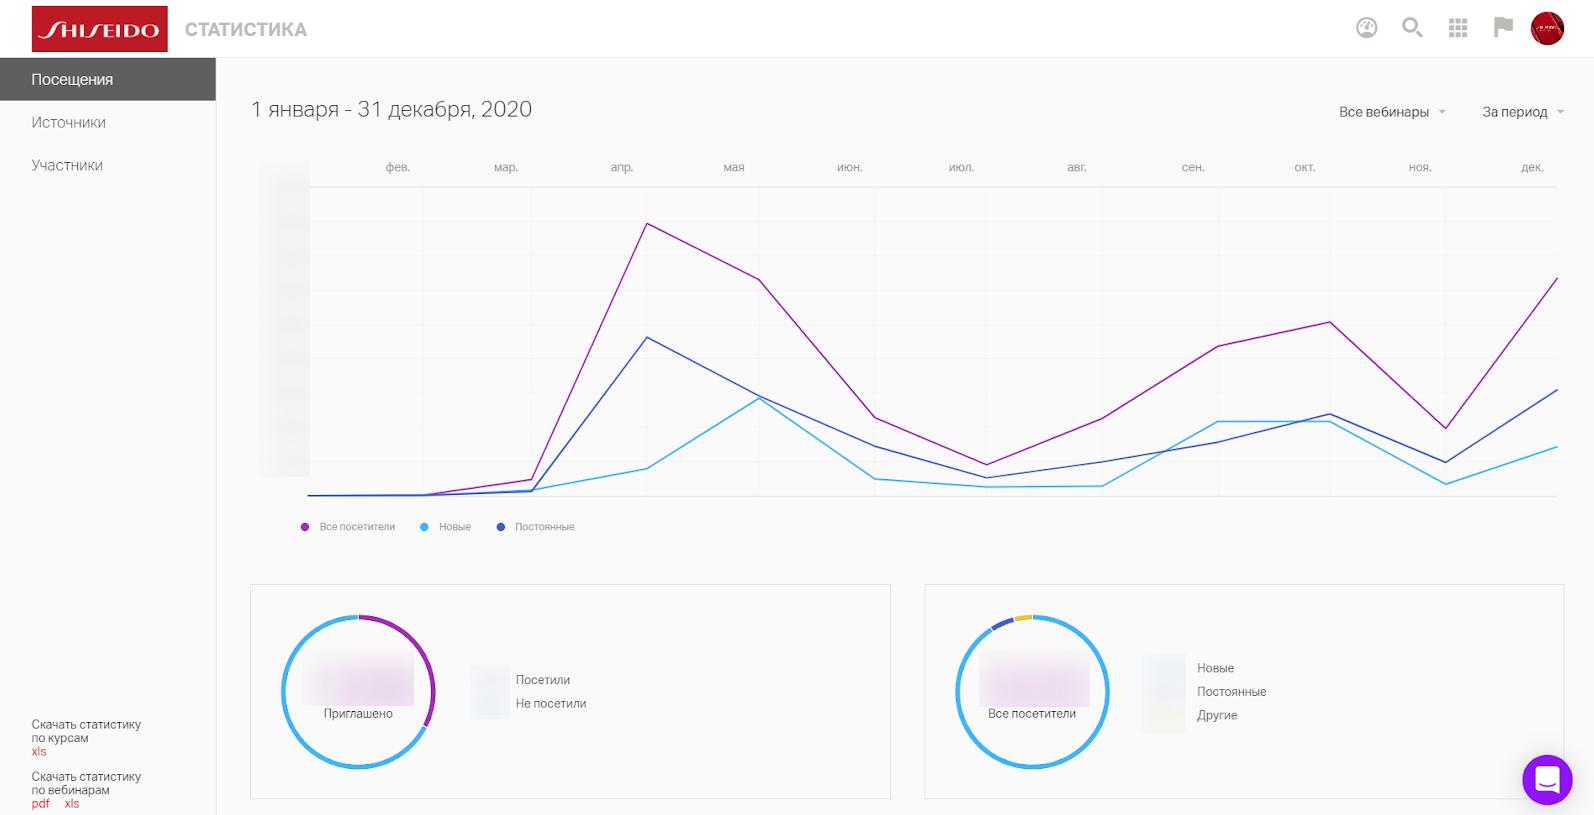 statistika_sheseido